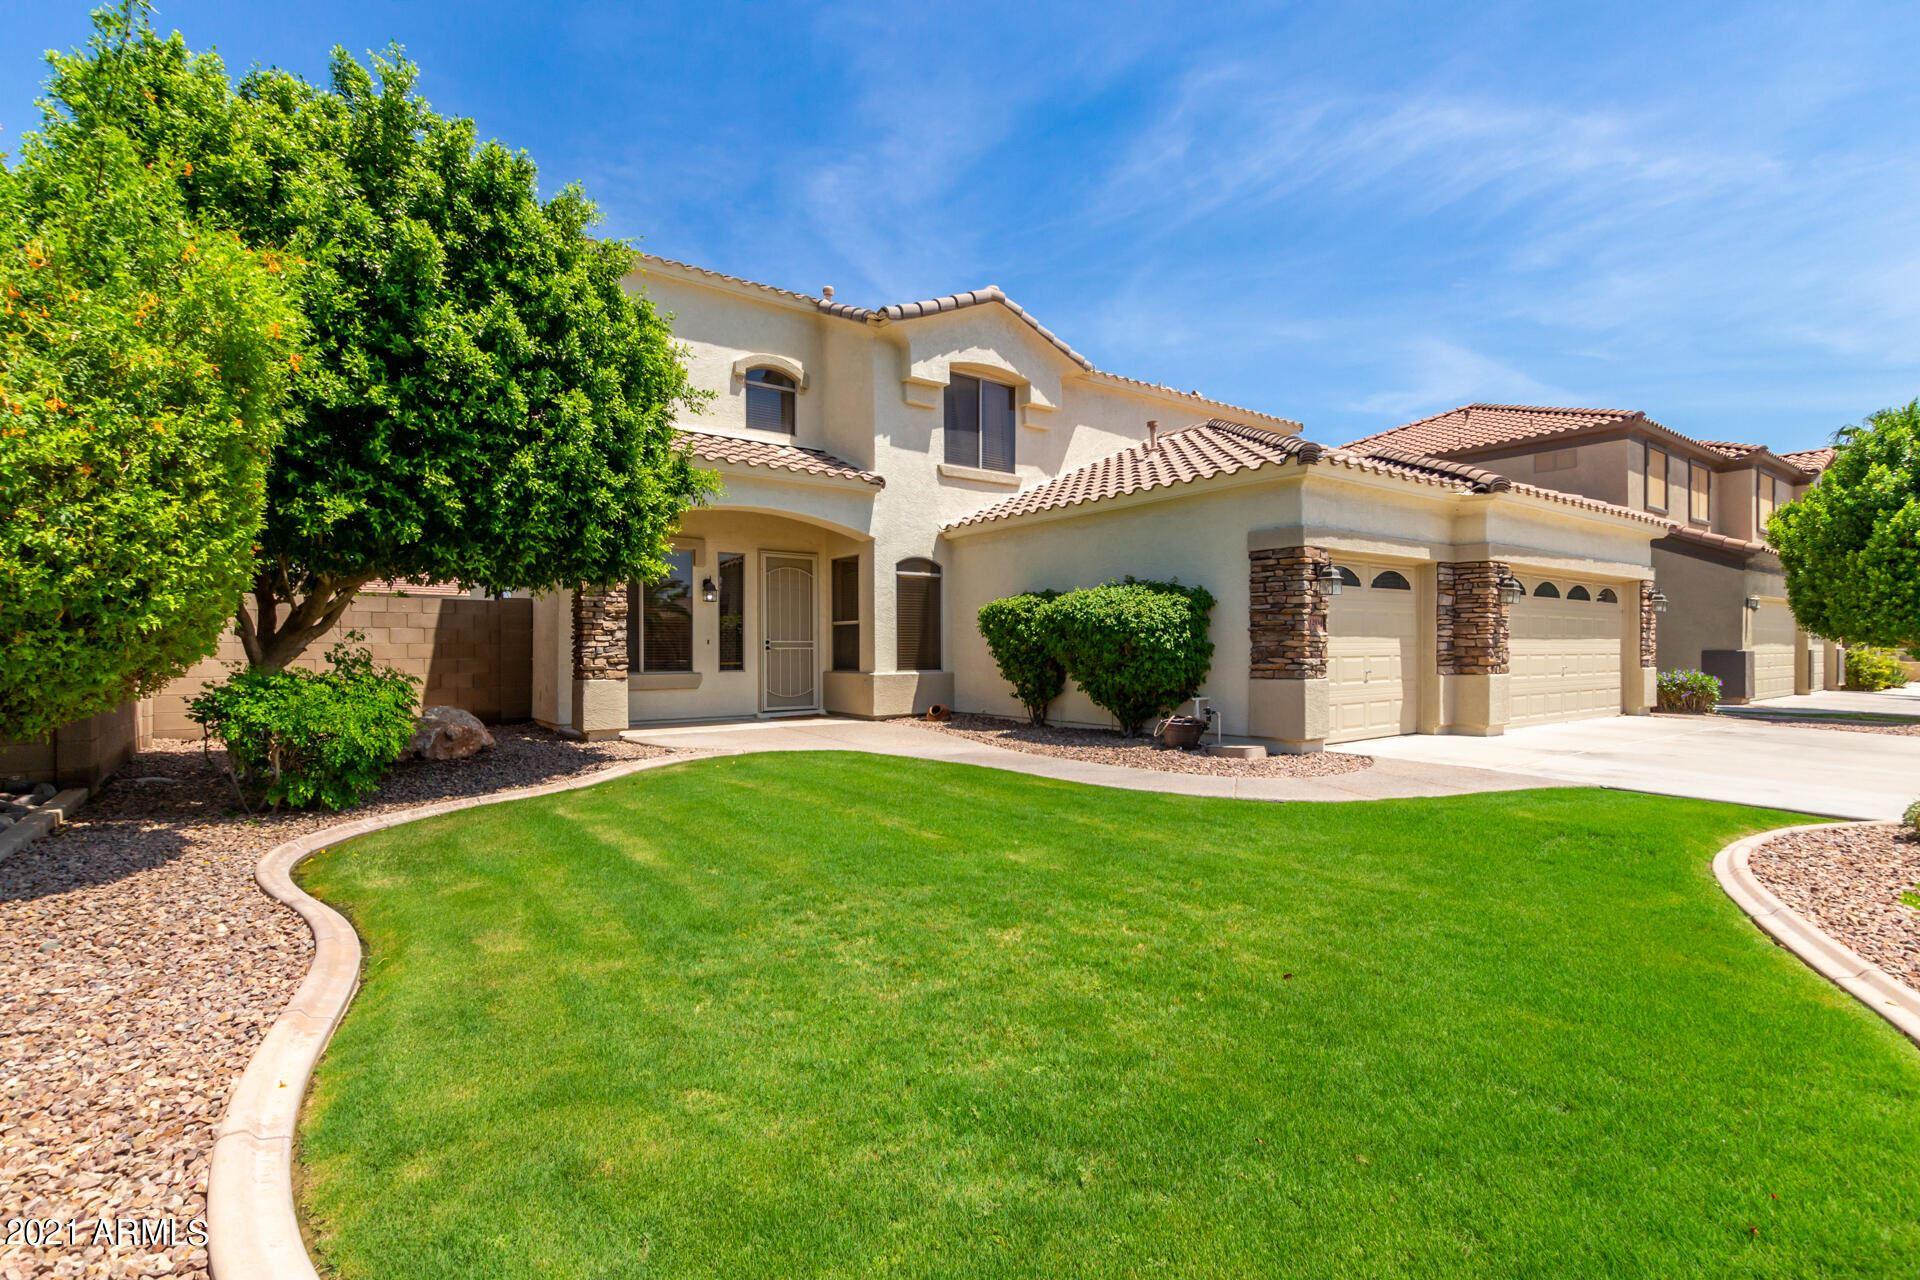 Photo of 12934 W VISTA PASEO Drive, Litchfield Park, AZ 85340 (MLS # 6270854)